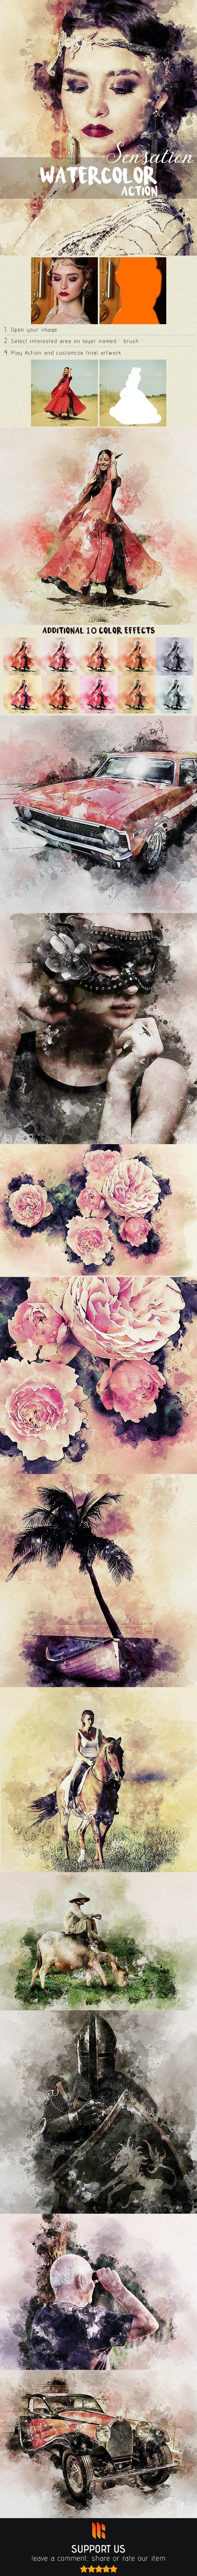 Sensation - Watercolor Photoshop Action - Photo Effects Actions